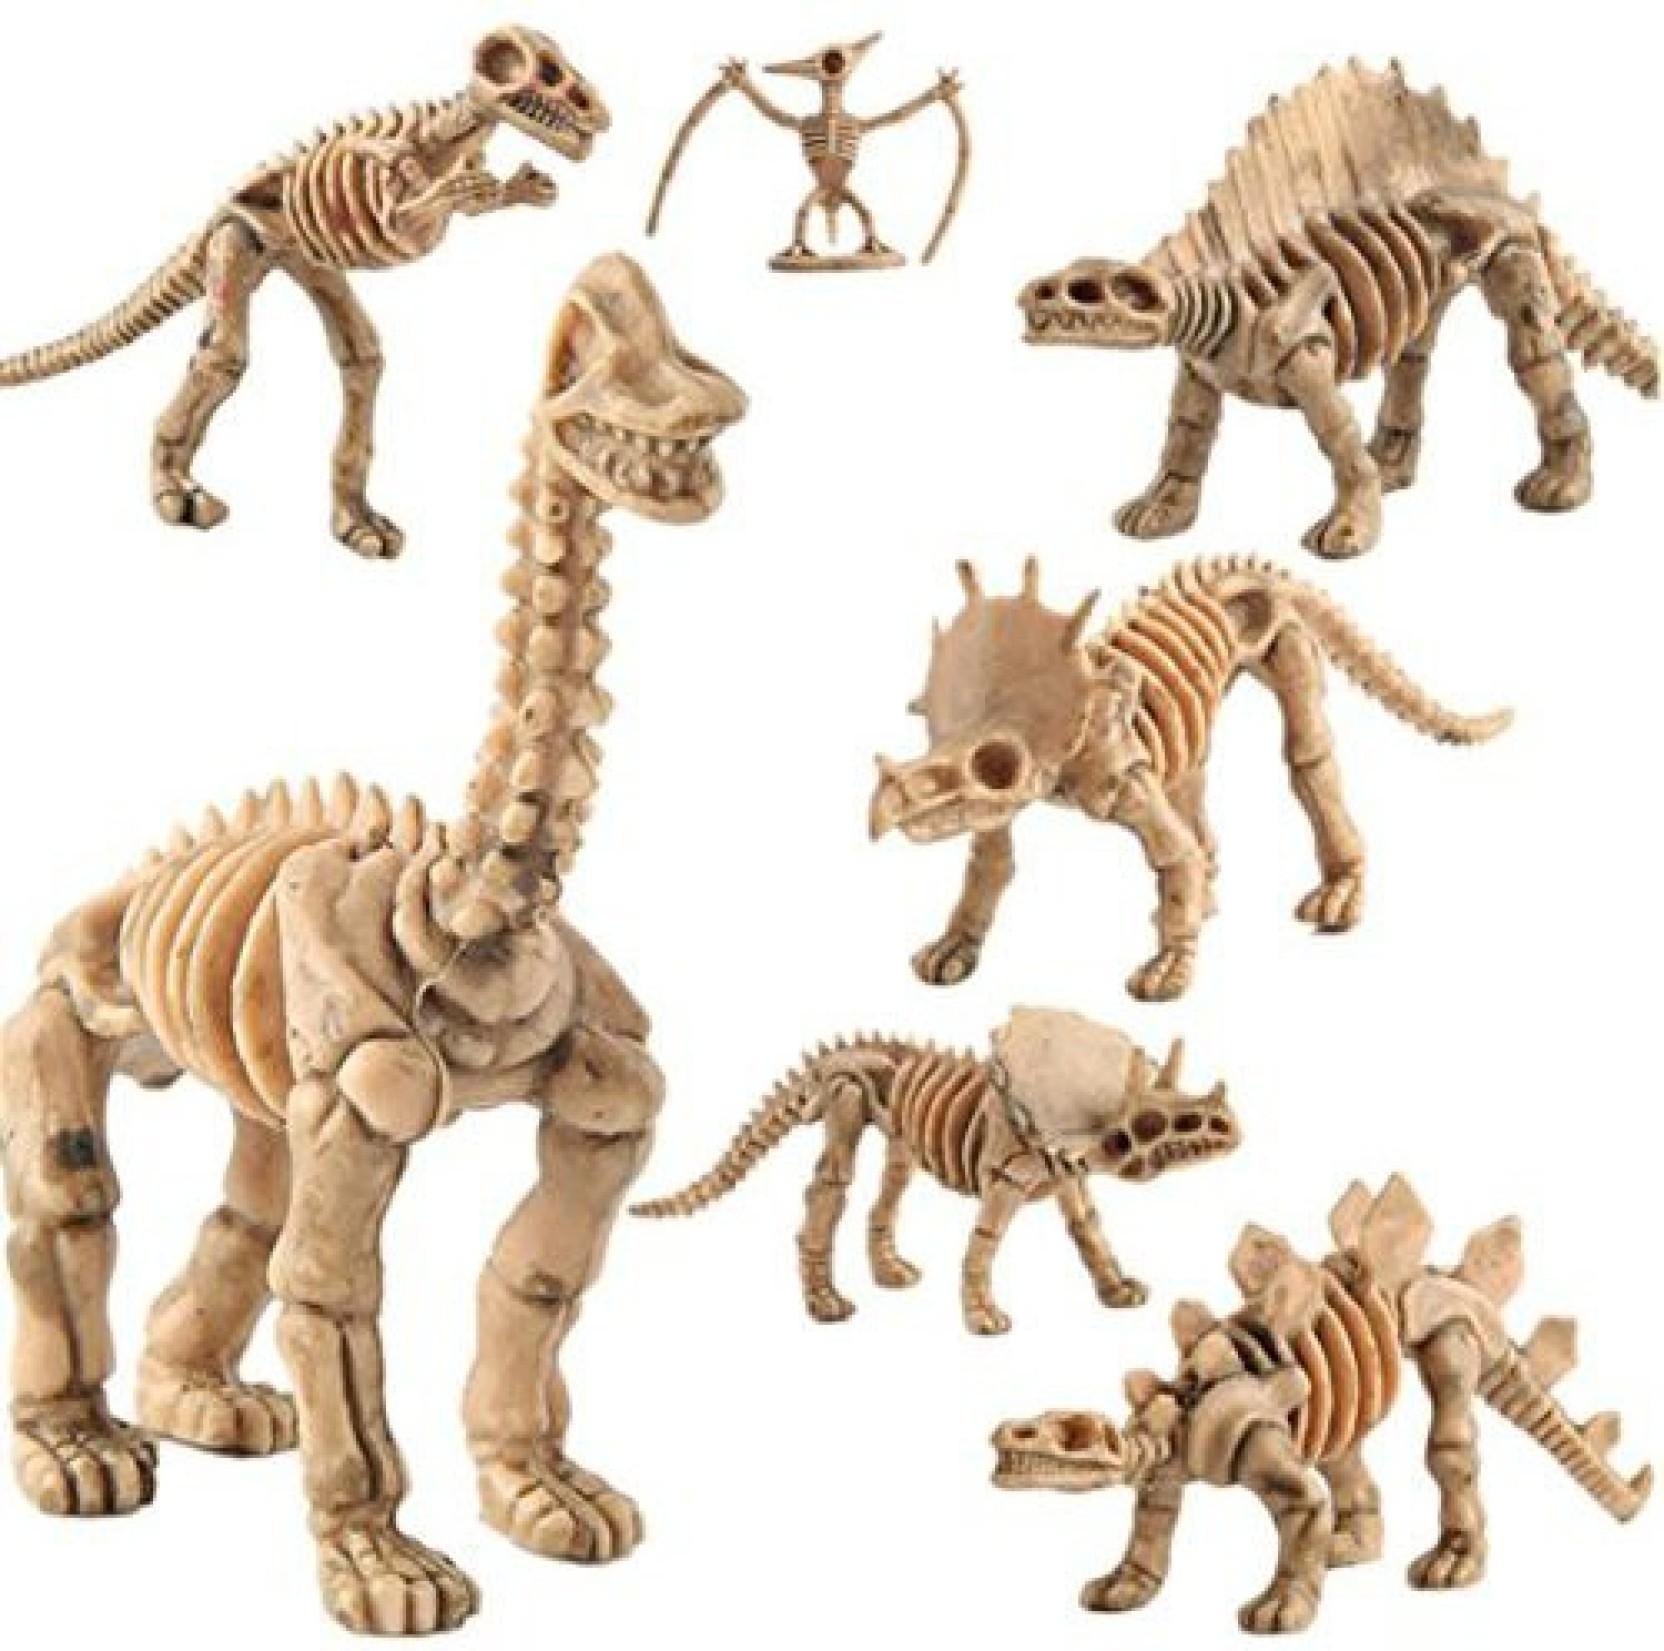 Hot Sale 12pcs Set Mini Dinosaur Model Play Toys Kids Children Toys For Fun Toys & Hobbies